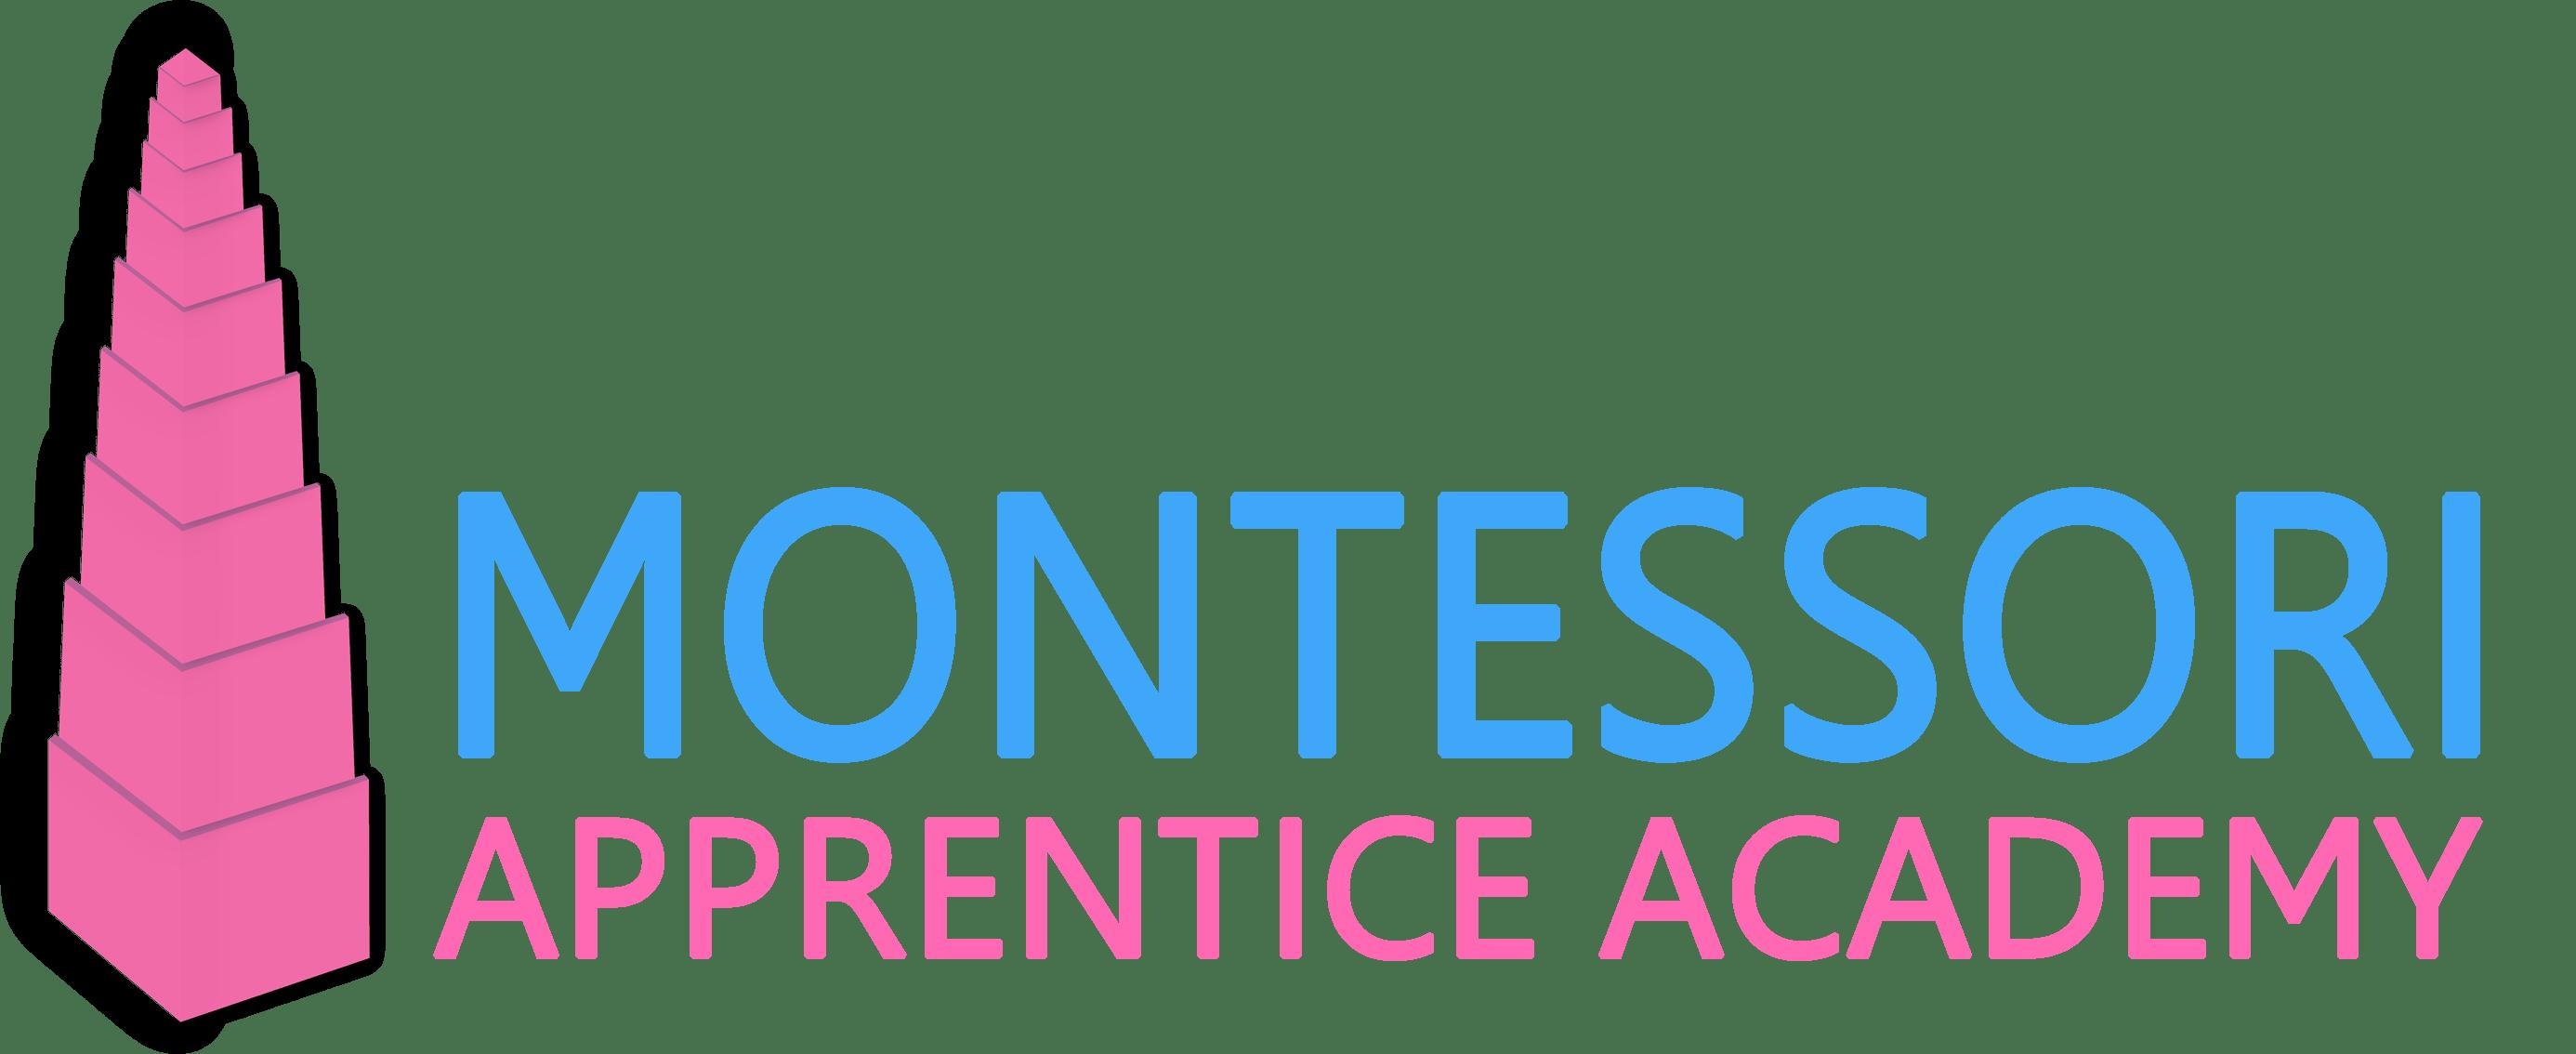 Montessori Apprentice Academy